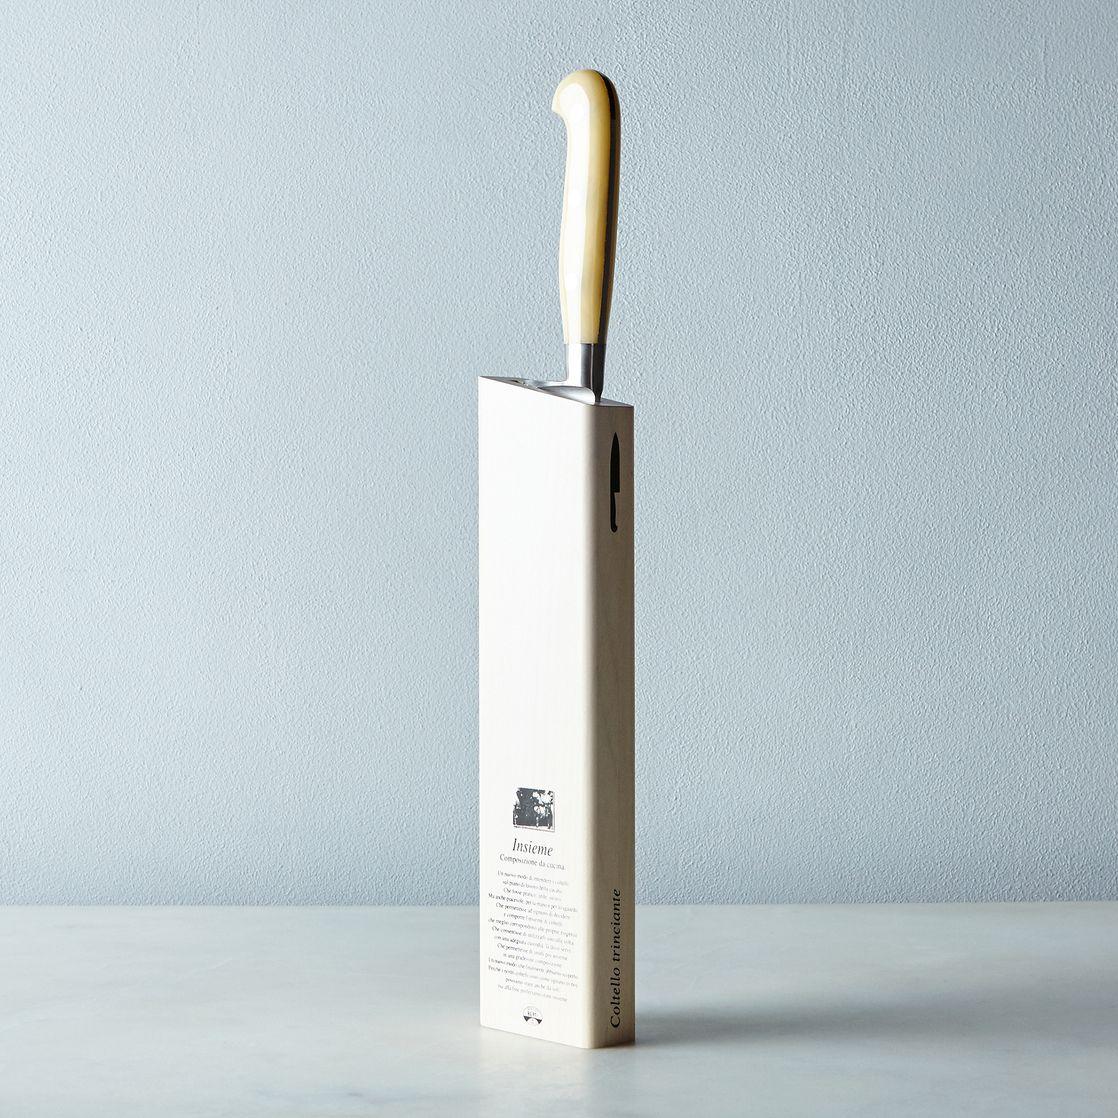 bourdain knife maker anthony bourdain knife maker anthony bourdain knife. Black Bedroom Furniture Sets. Home Design Ideas